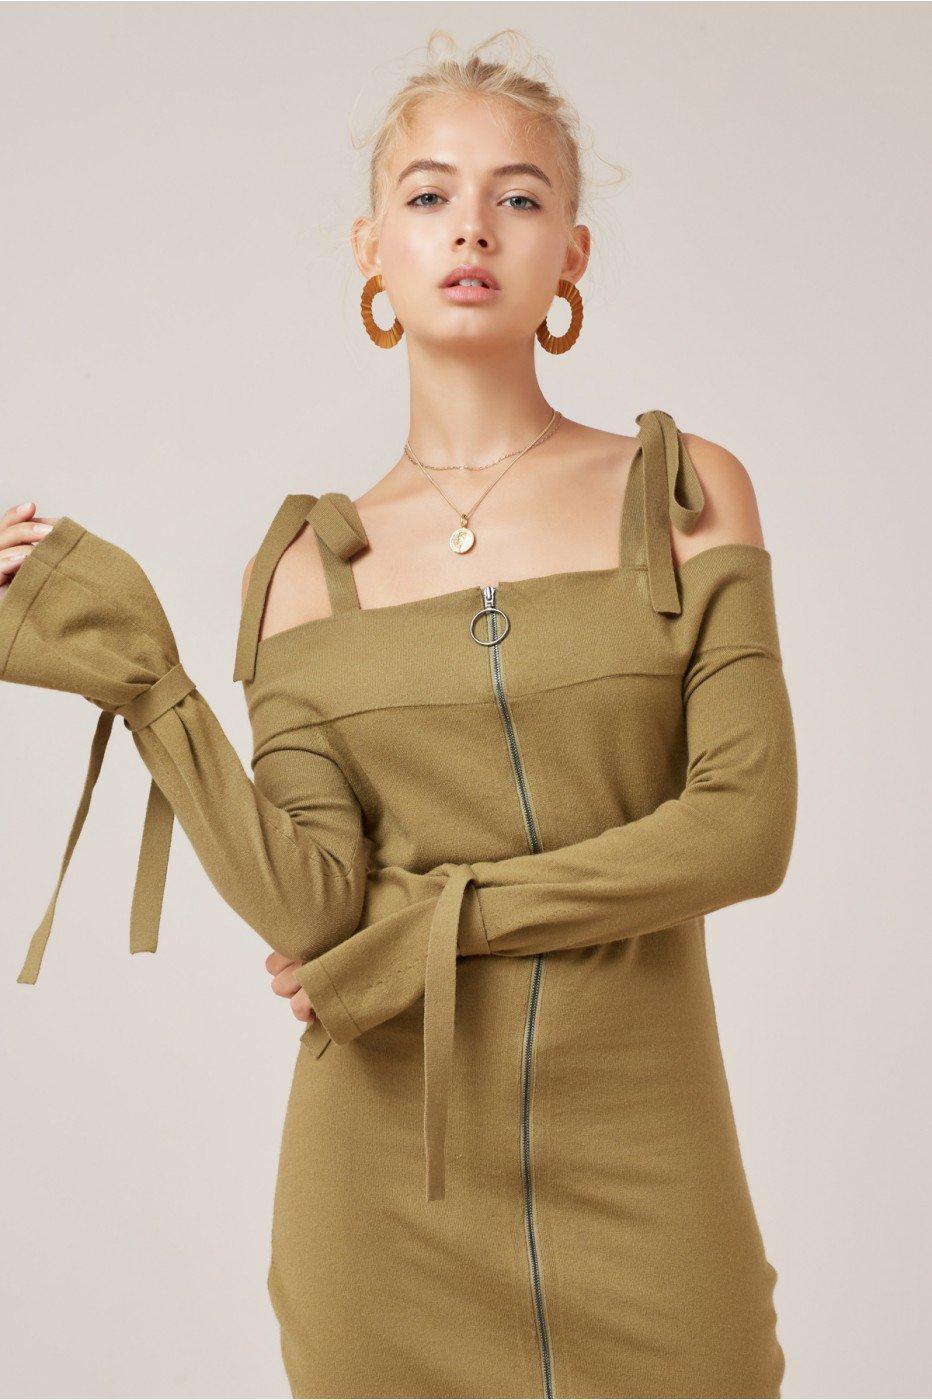 Finders Keepers Objects Knit Dress In Juniper